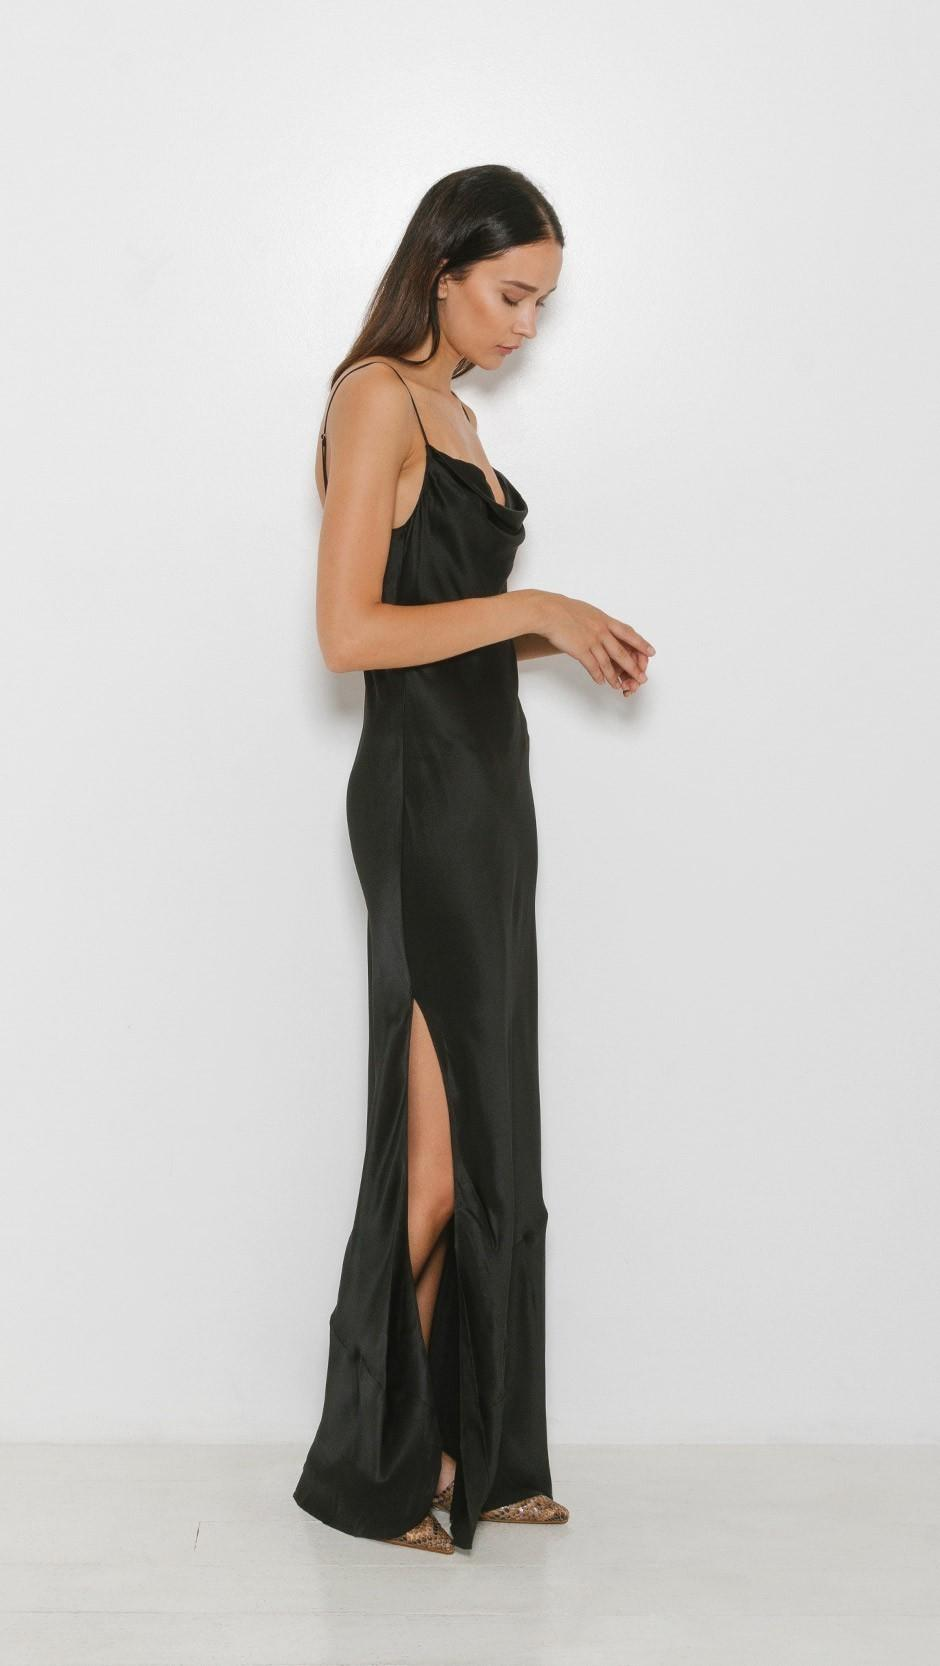 Nili Lotan Alexa Dress Black size 8 | The Volte